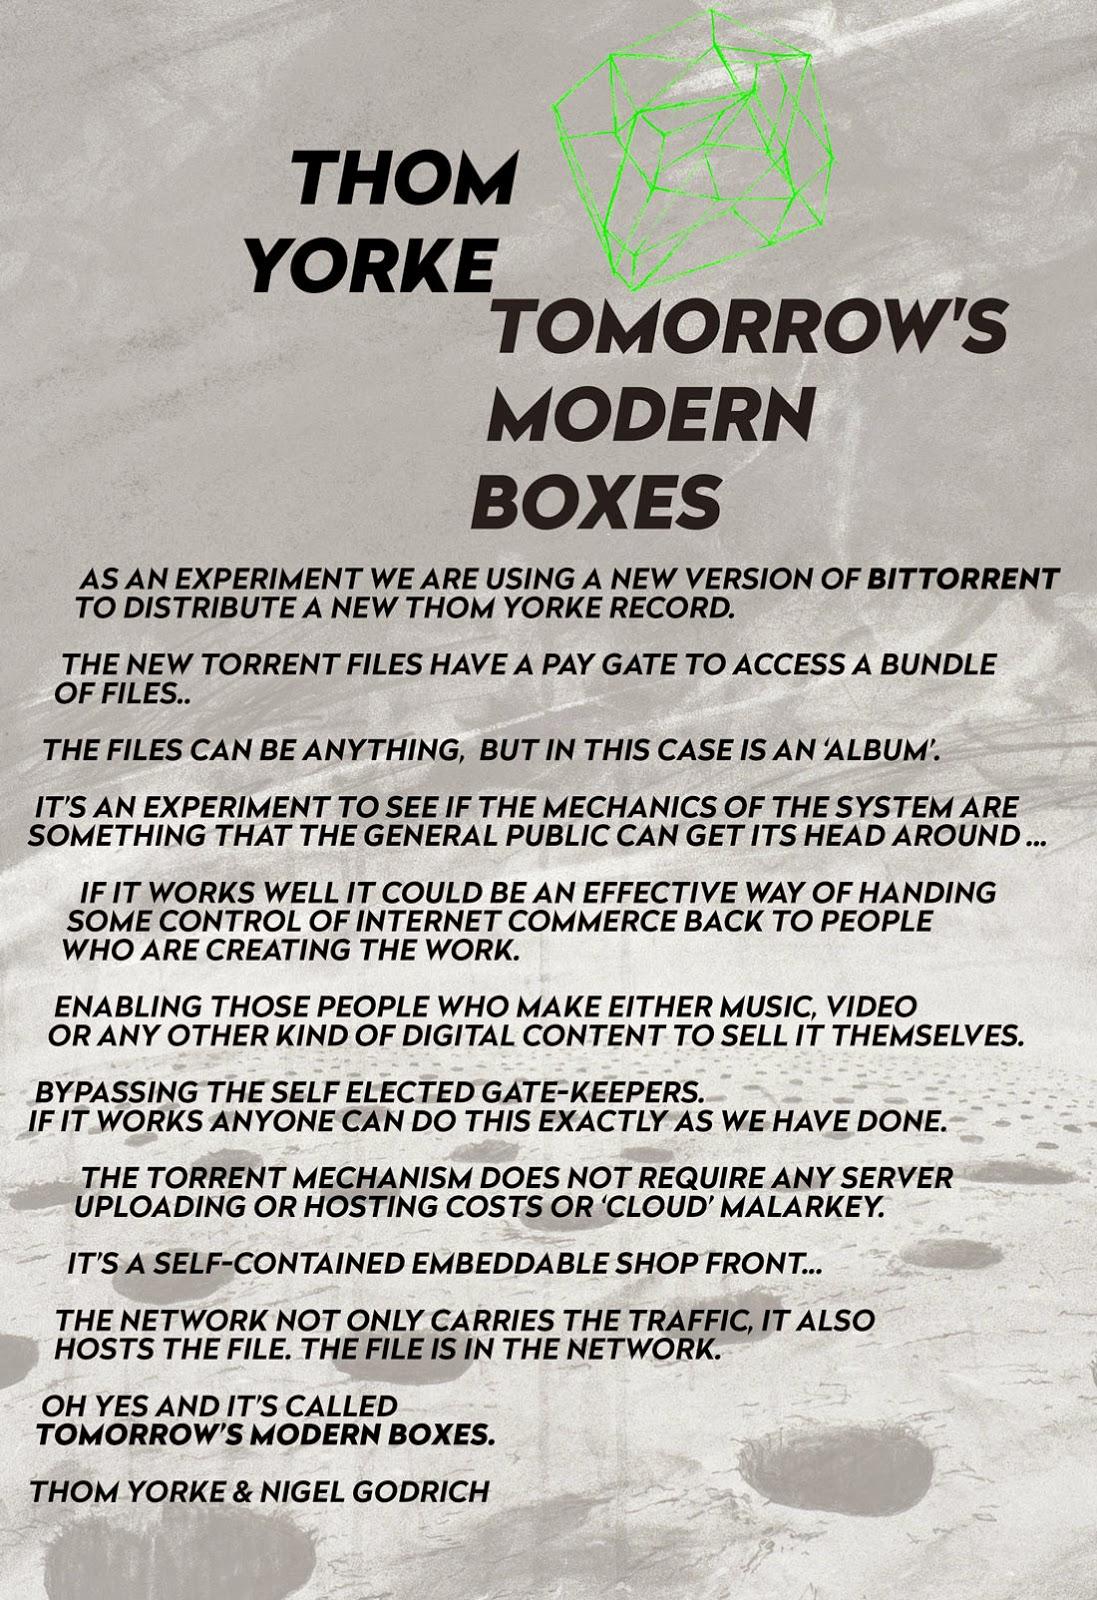 TomorrowsModernBoxes blog